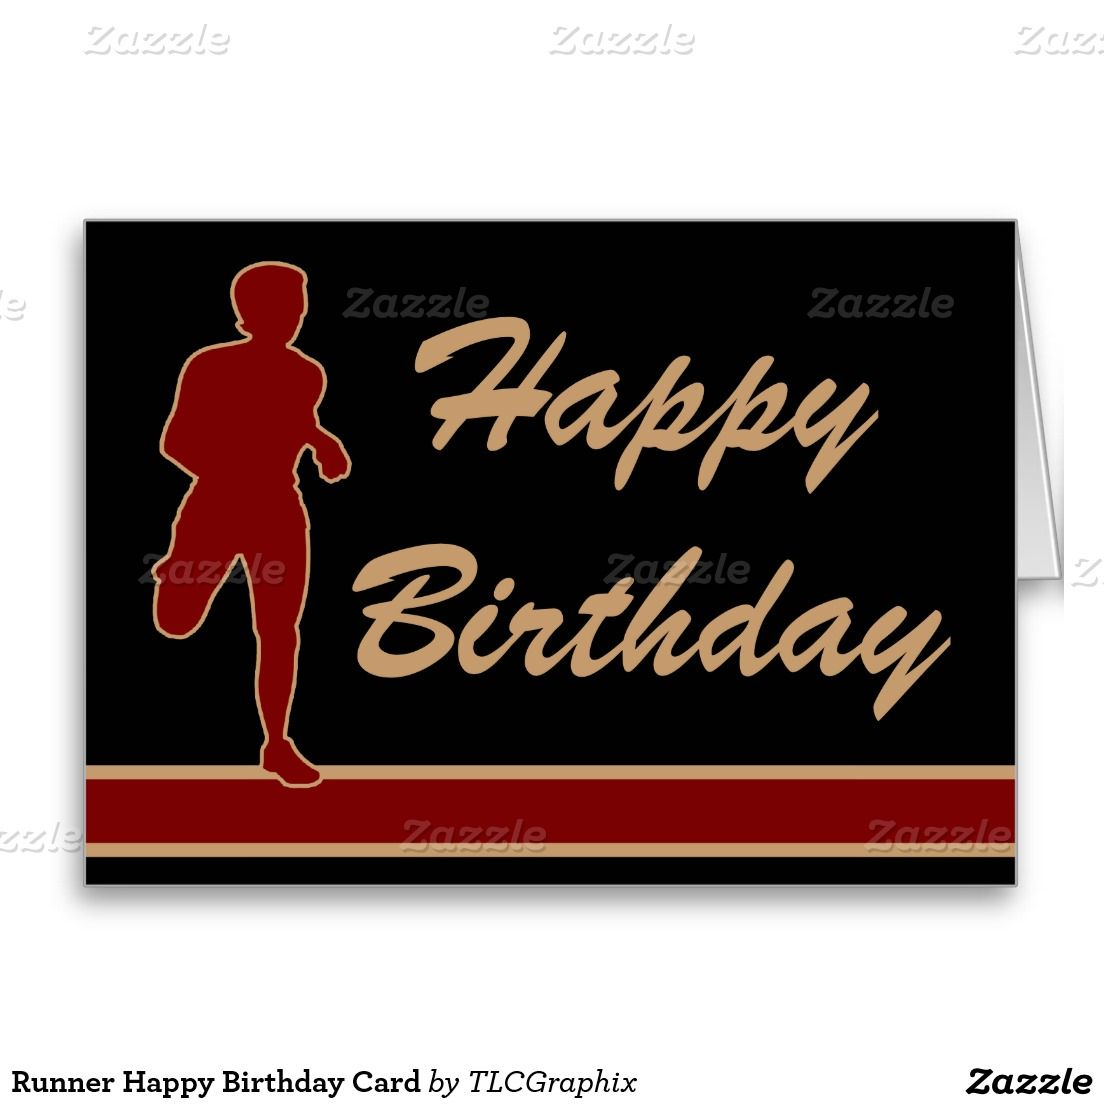 Runner Happy Birthday Card Happy Birthday Cards Happy Birthday Pictures Happy Birthday